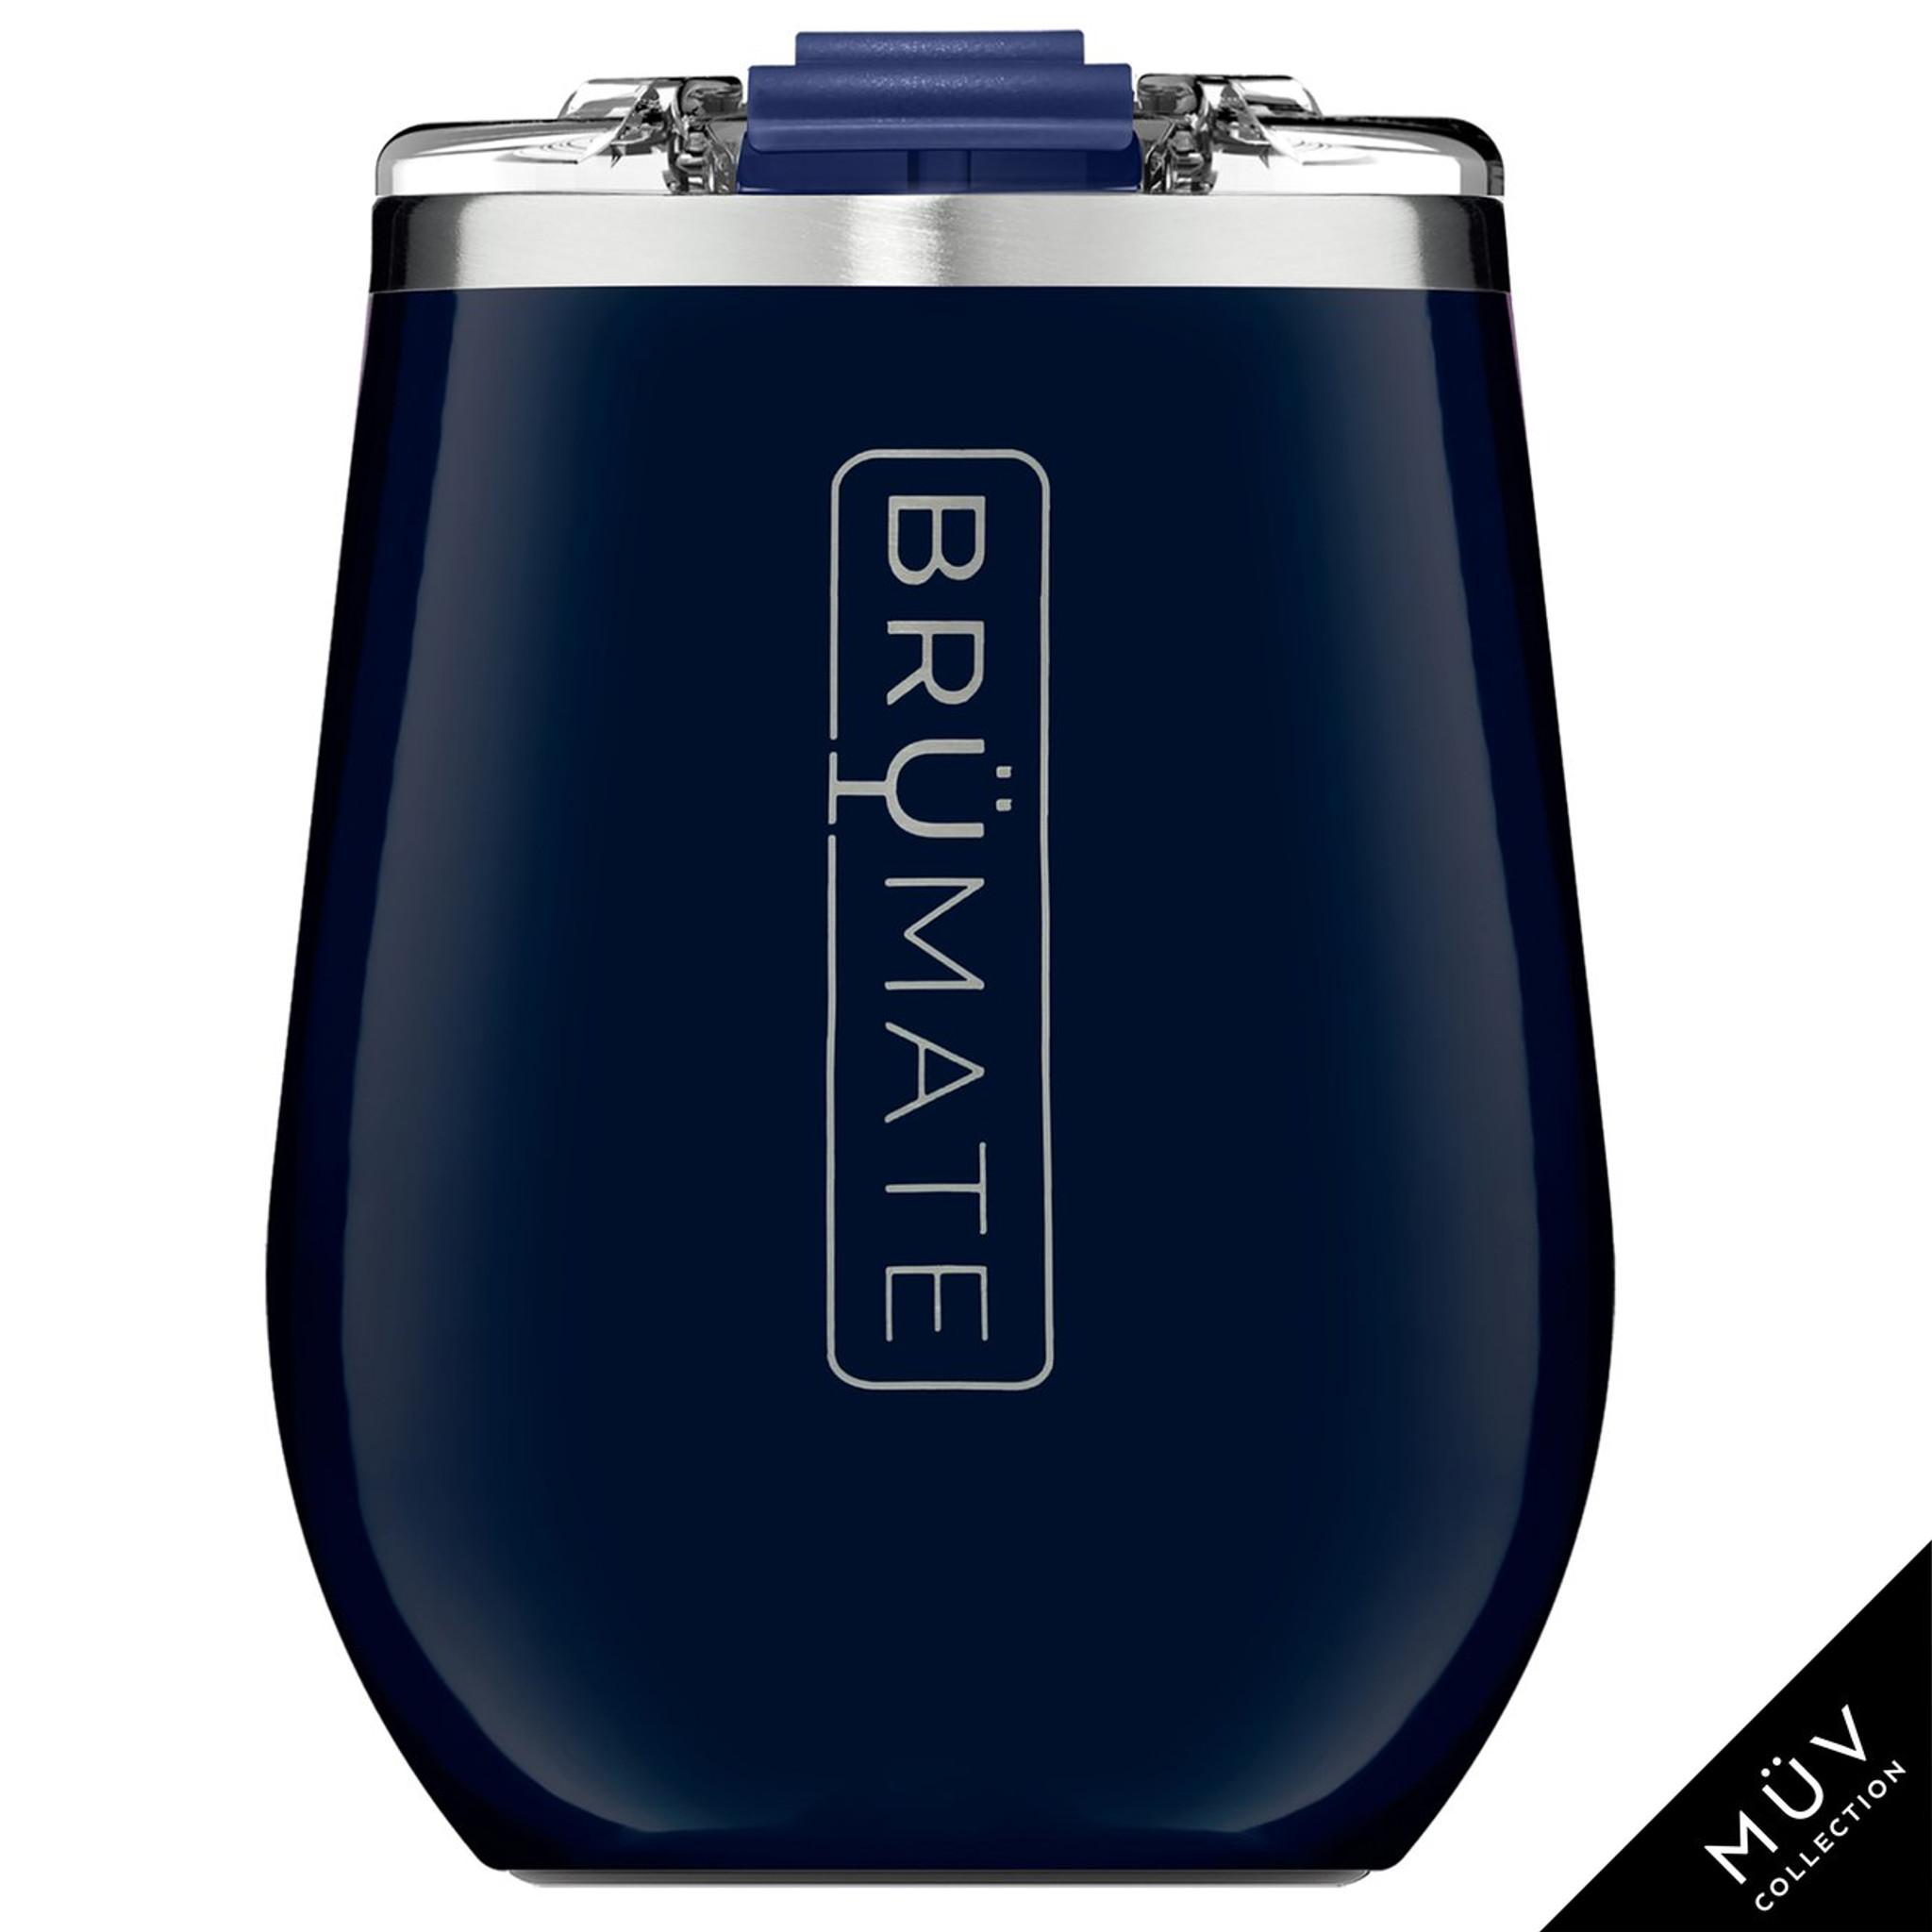 Brumate MUV Wine Tumbler - Navy